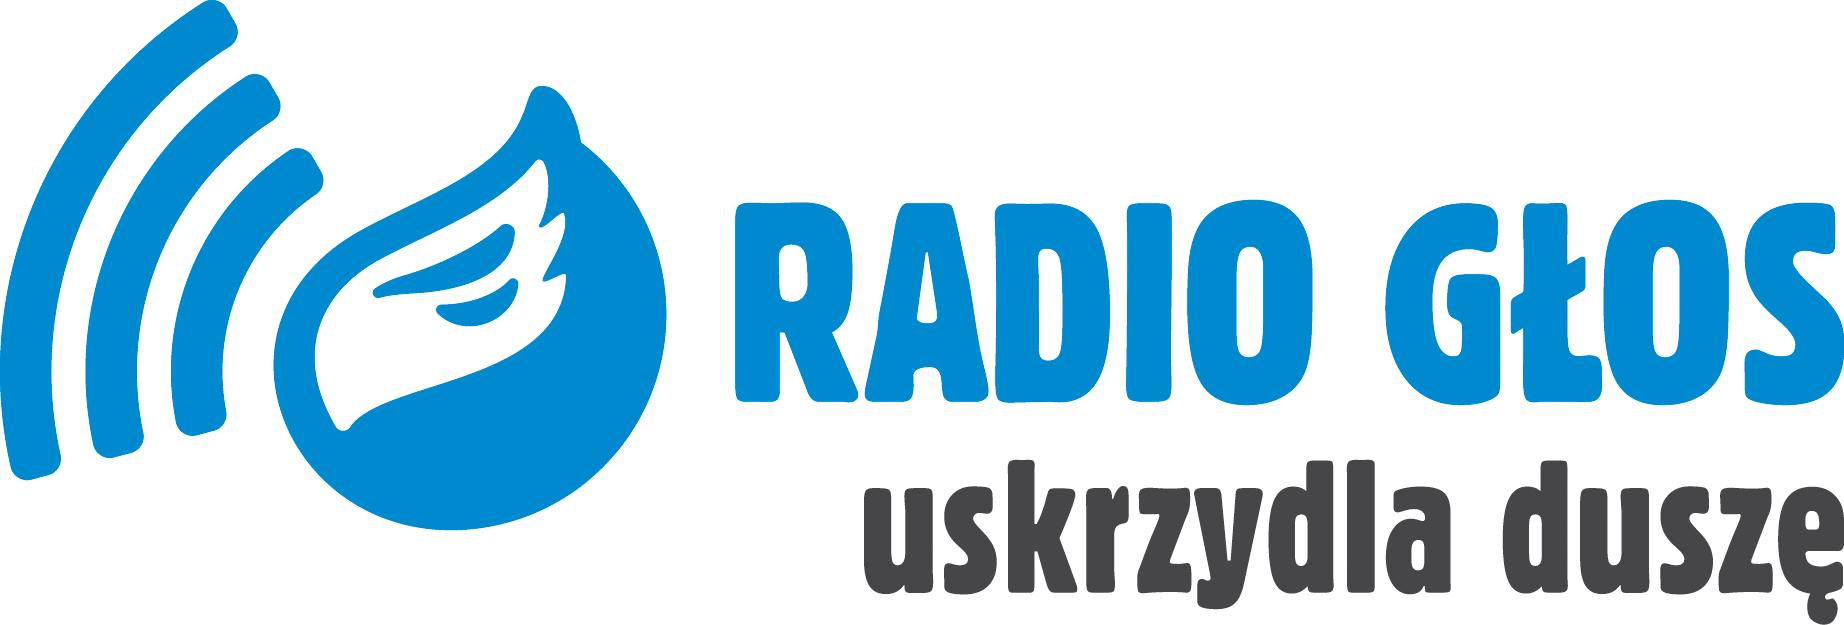 http://radioglos.pl/images/banery/RG-02-CMYK-slogan_RGB.jpg